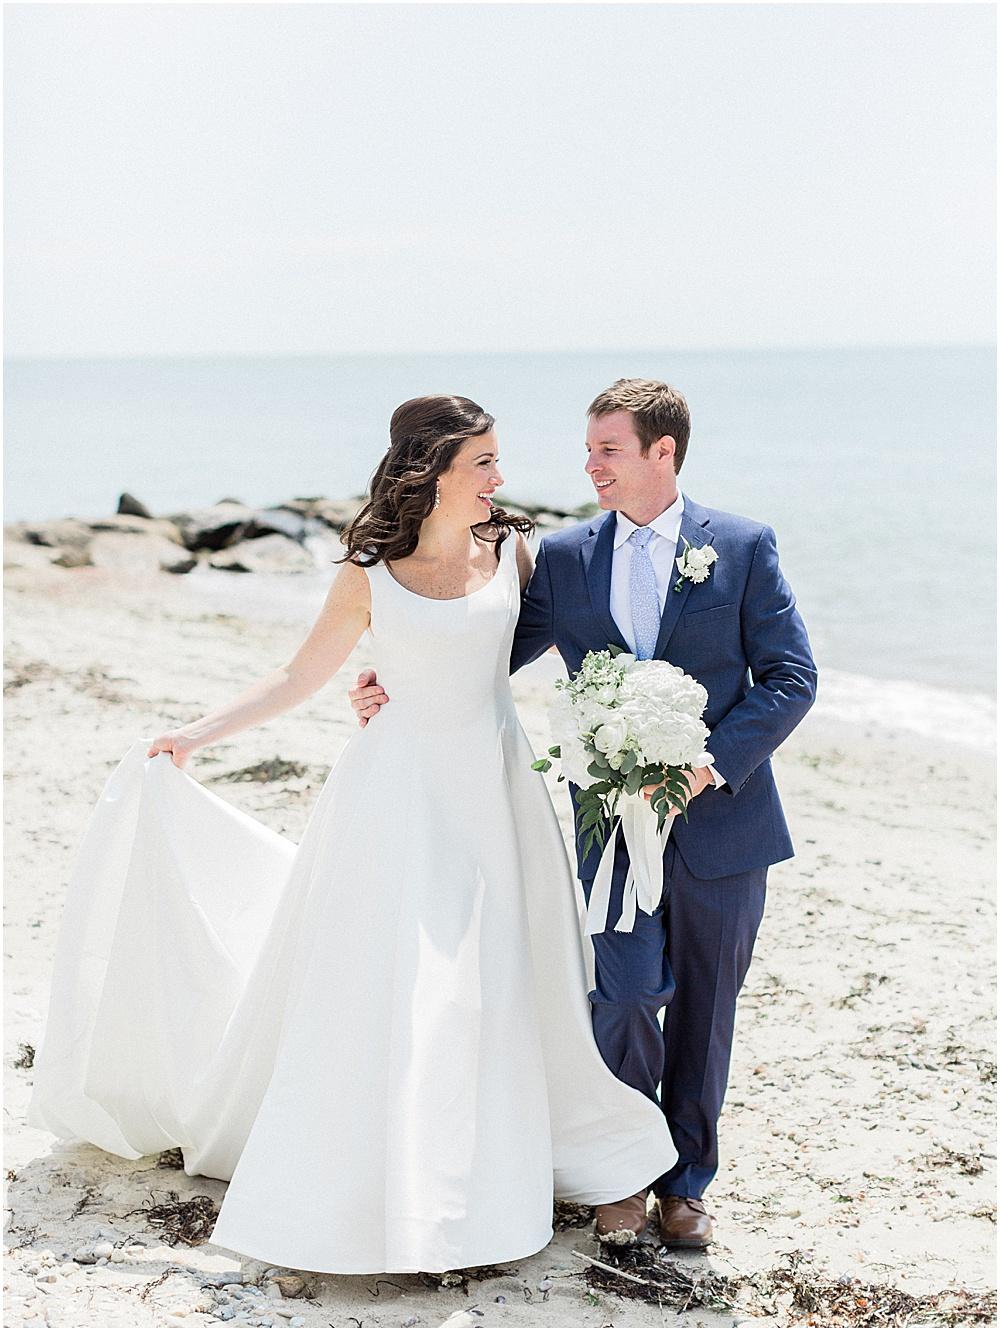 sea_crest_beach_club_st_anthonys_falmouth_old_silver_massachusetts_boston_wedding_photographer_meredith_jane_photography_photo_0392.jpg